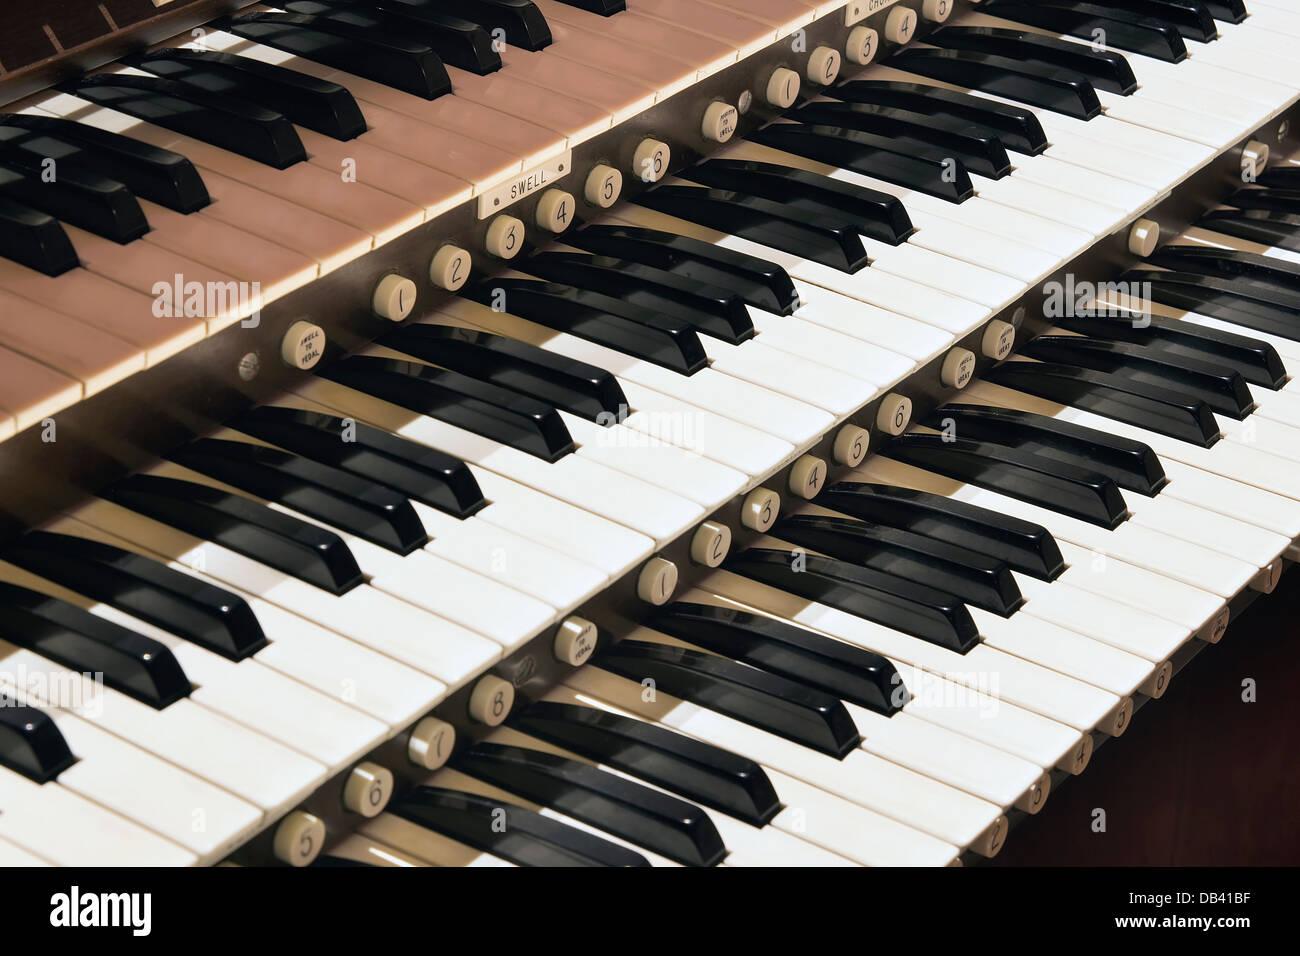 Church Pipe Organ Keyboard Closeup Macro - Stock Image